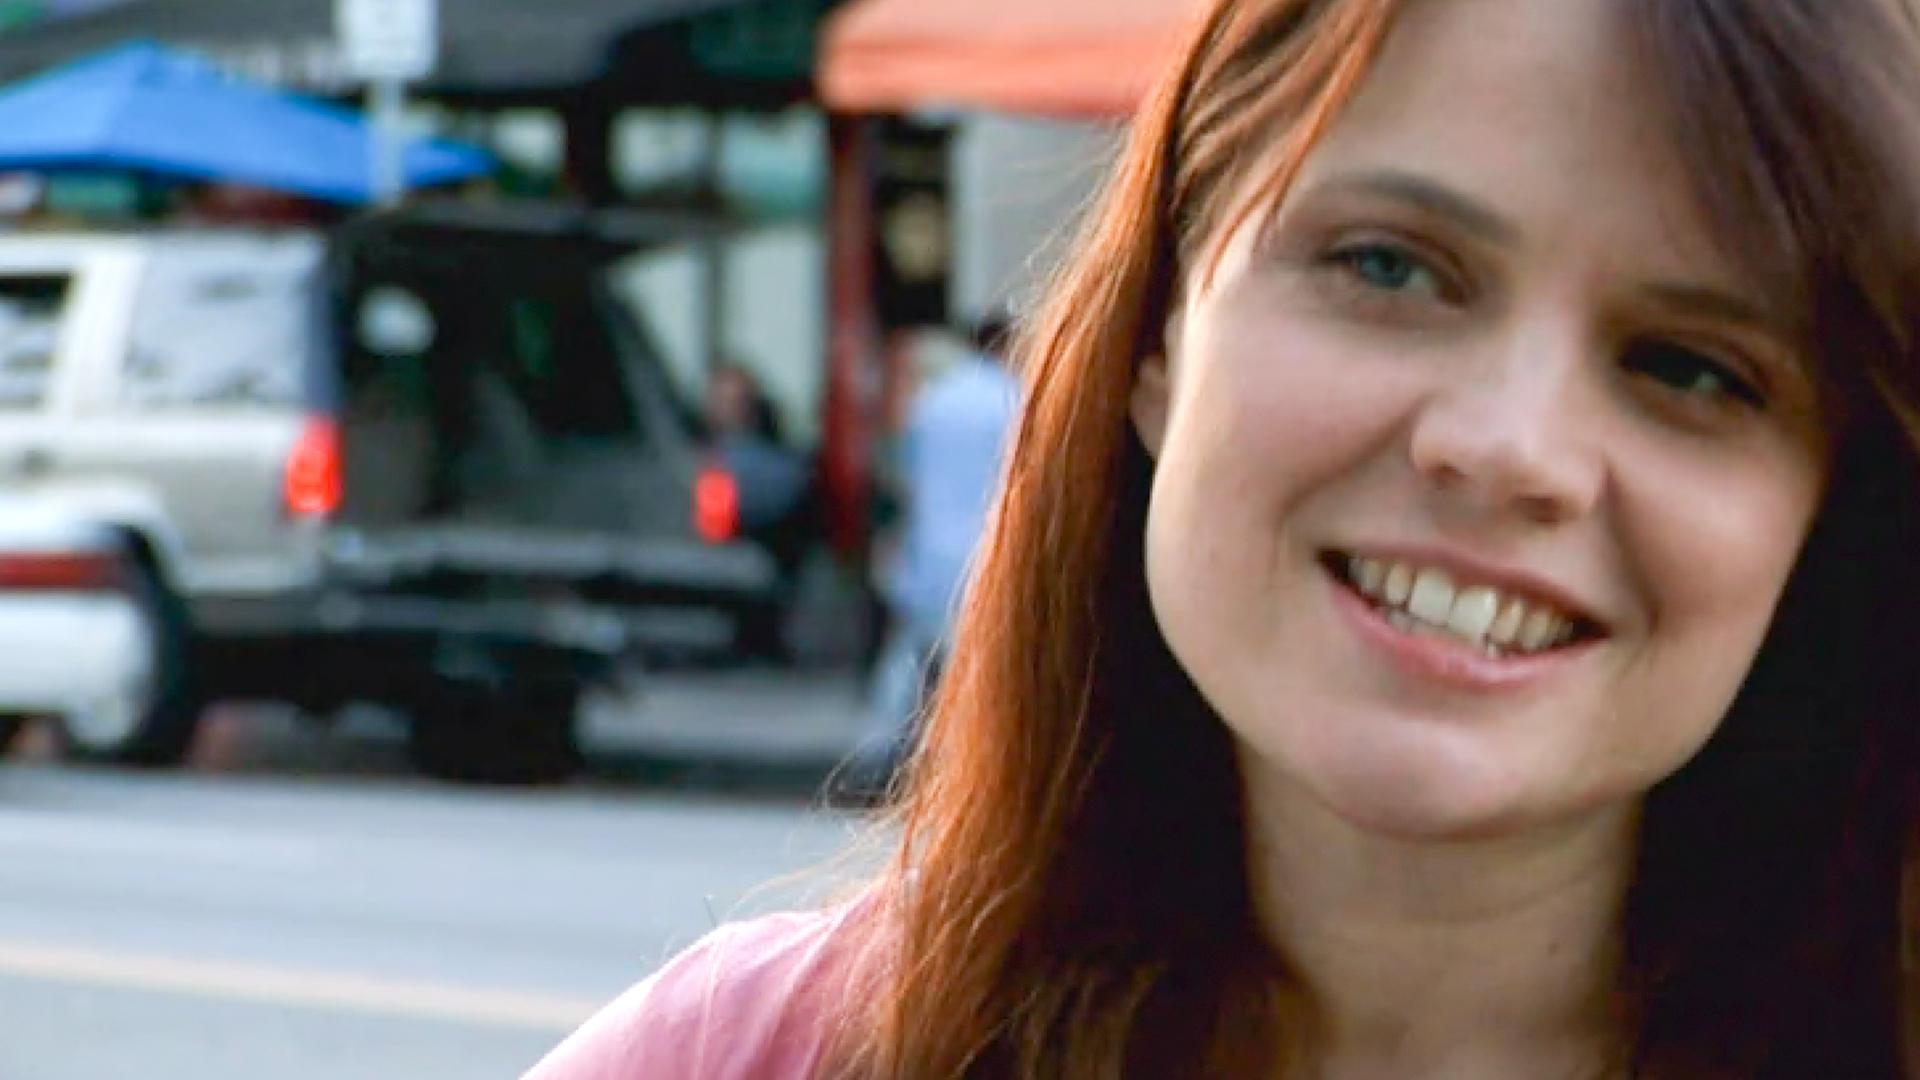 June, filmproducer